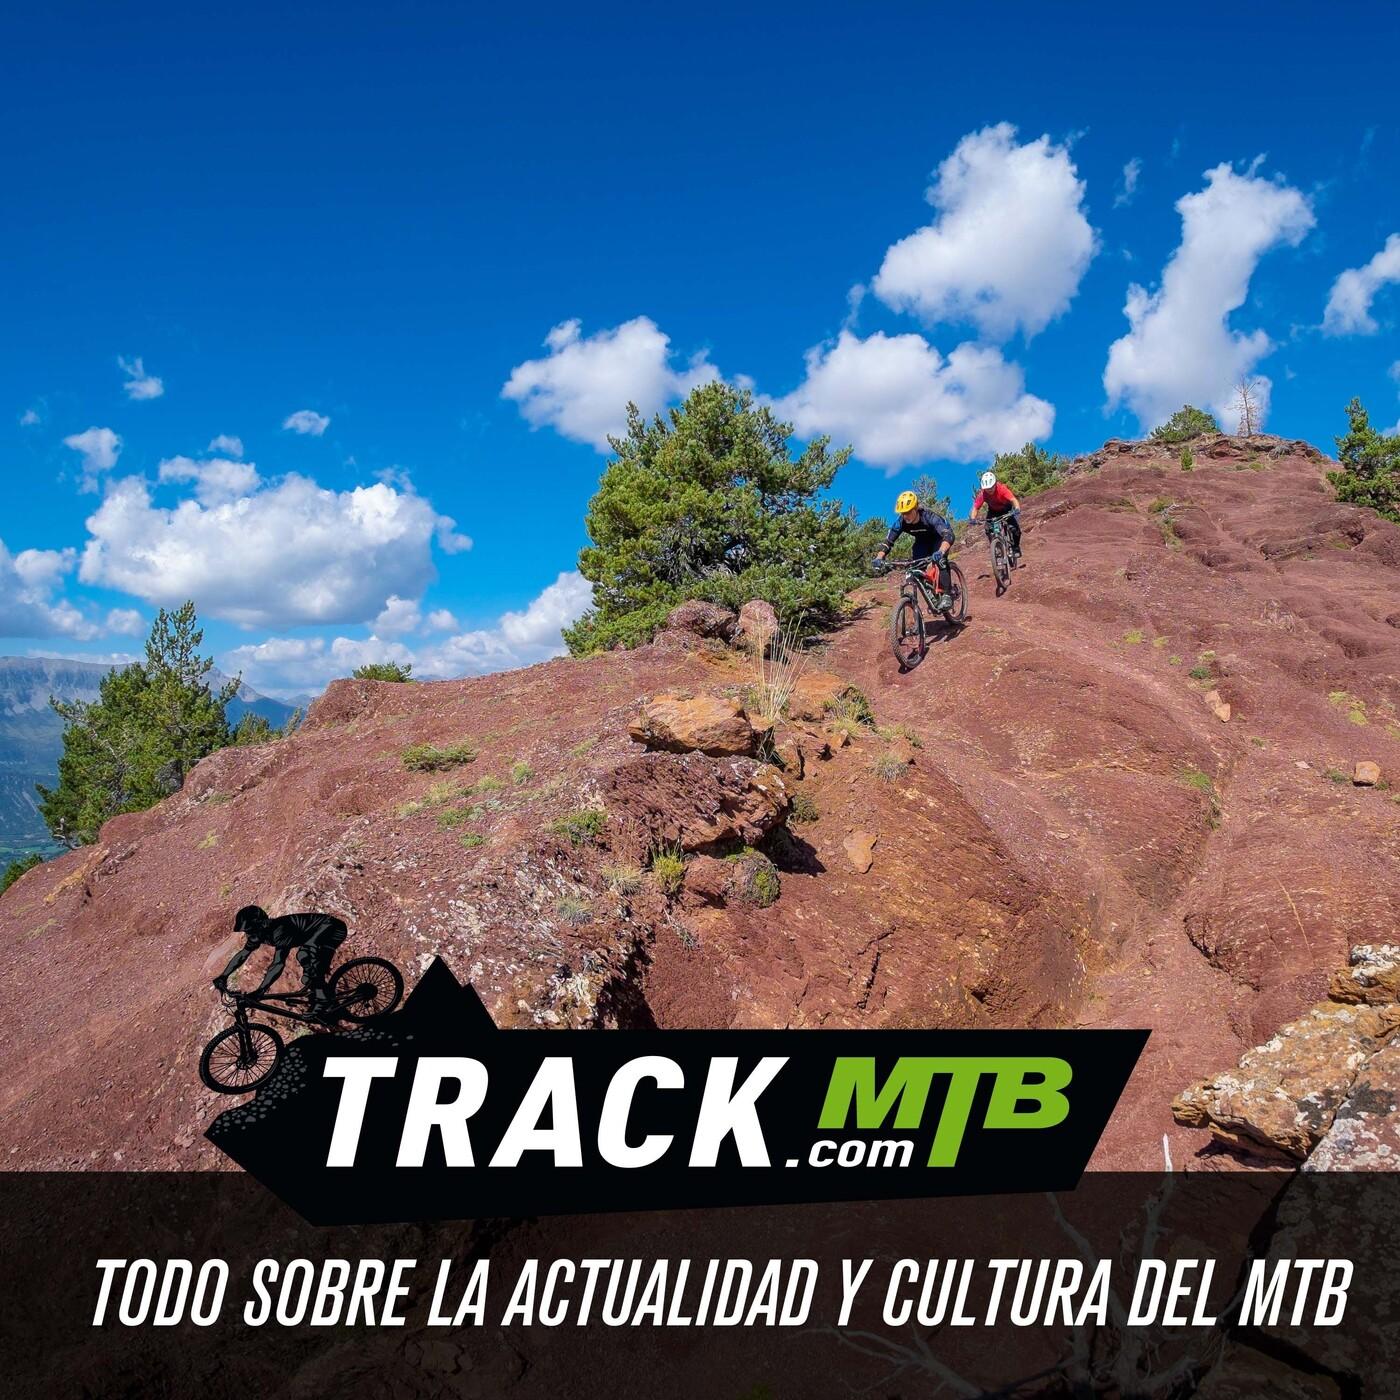 Ep 60 Joana Monteiro Nos Desnuda Test Productos Mrp En Track Mtb